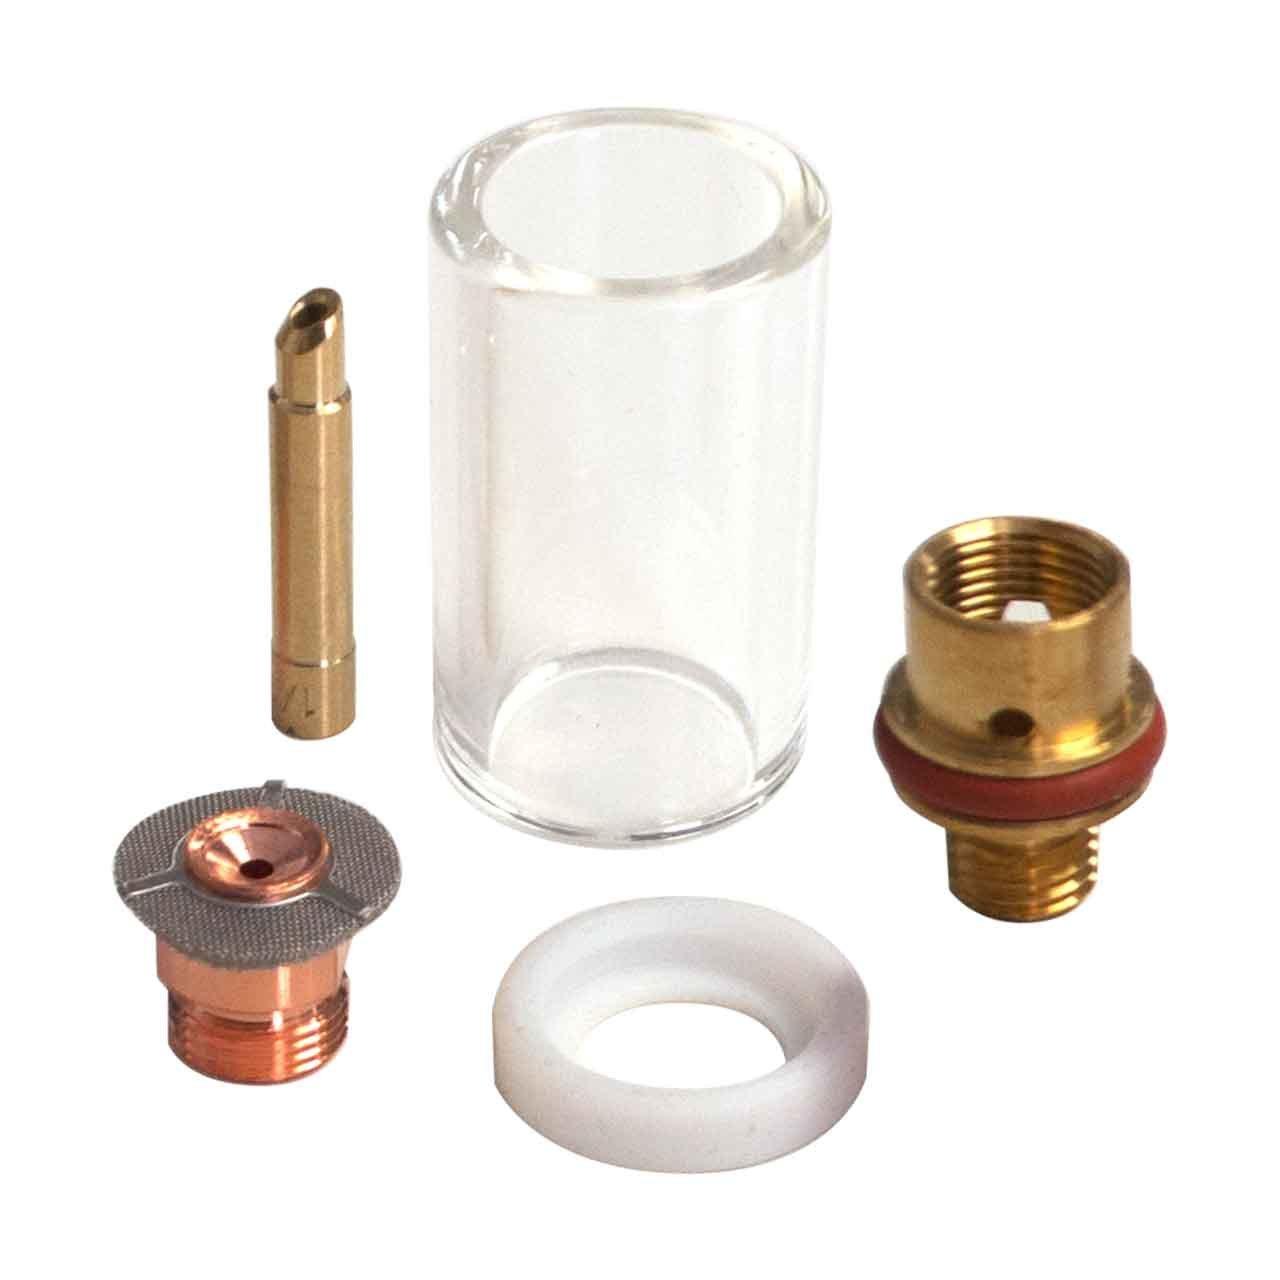 CK D2GS116-P Gas Saver Kit for 1/16' w/Pyrex Cup CK Worldwide